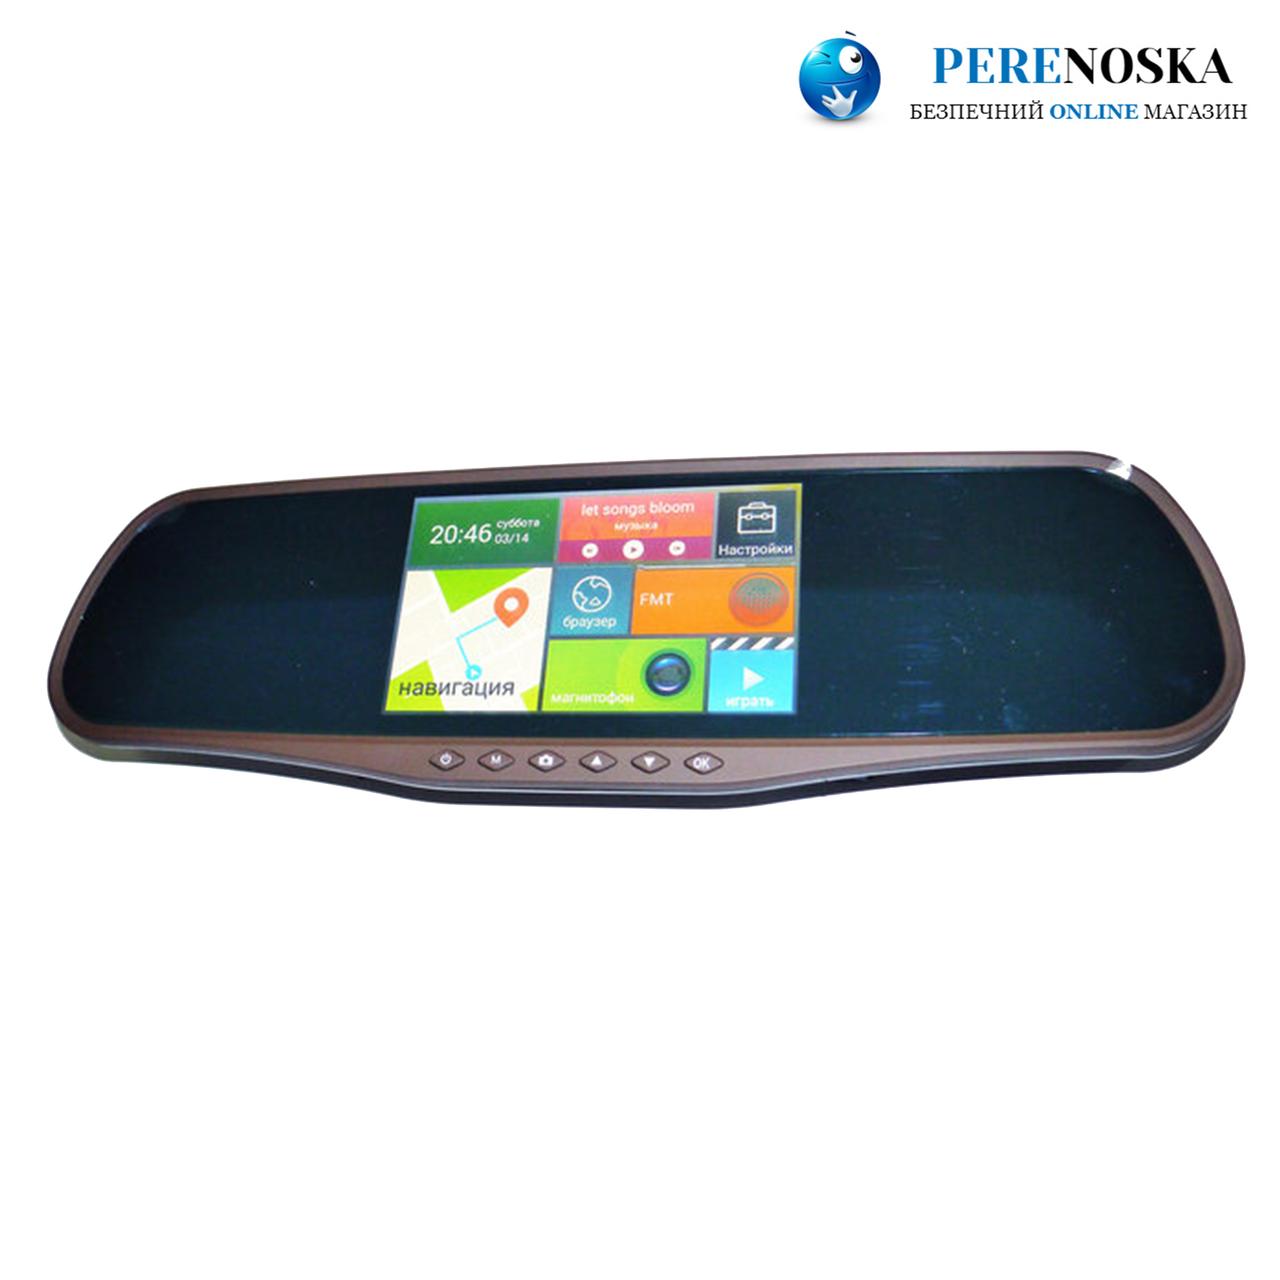 "D25 Зеркало регистратор, 5"" сенсор, 2 камеры, GPS навигатор, WiFI, 8Gb, Android"